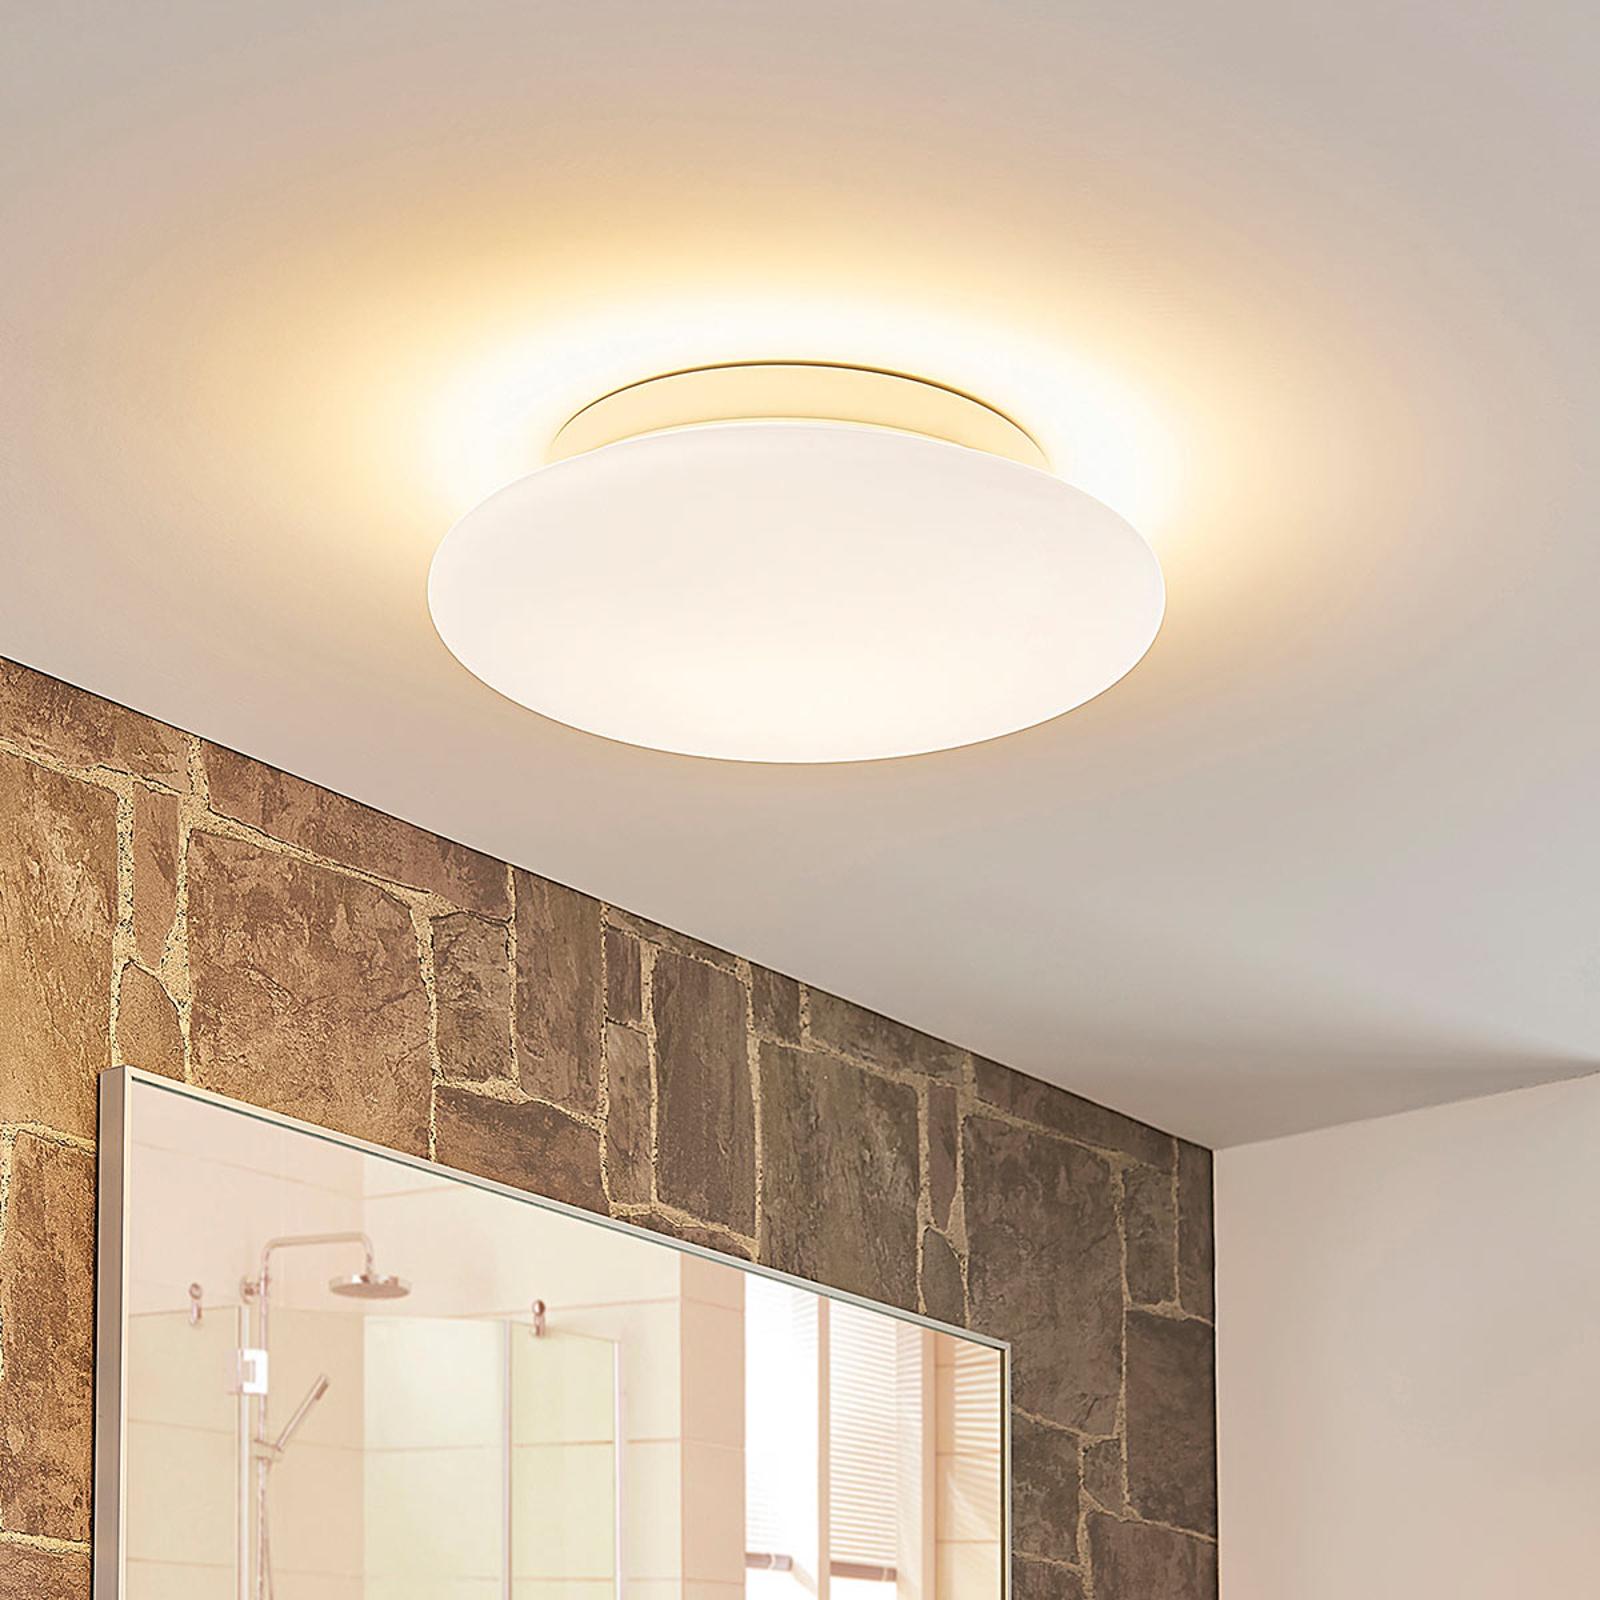 Lámpara LED de techo Toan circular, IP44 atenuable